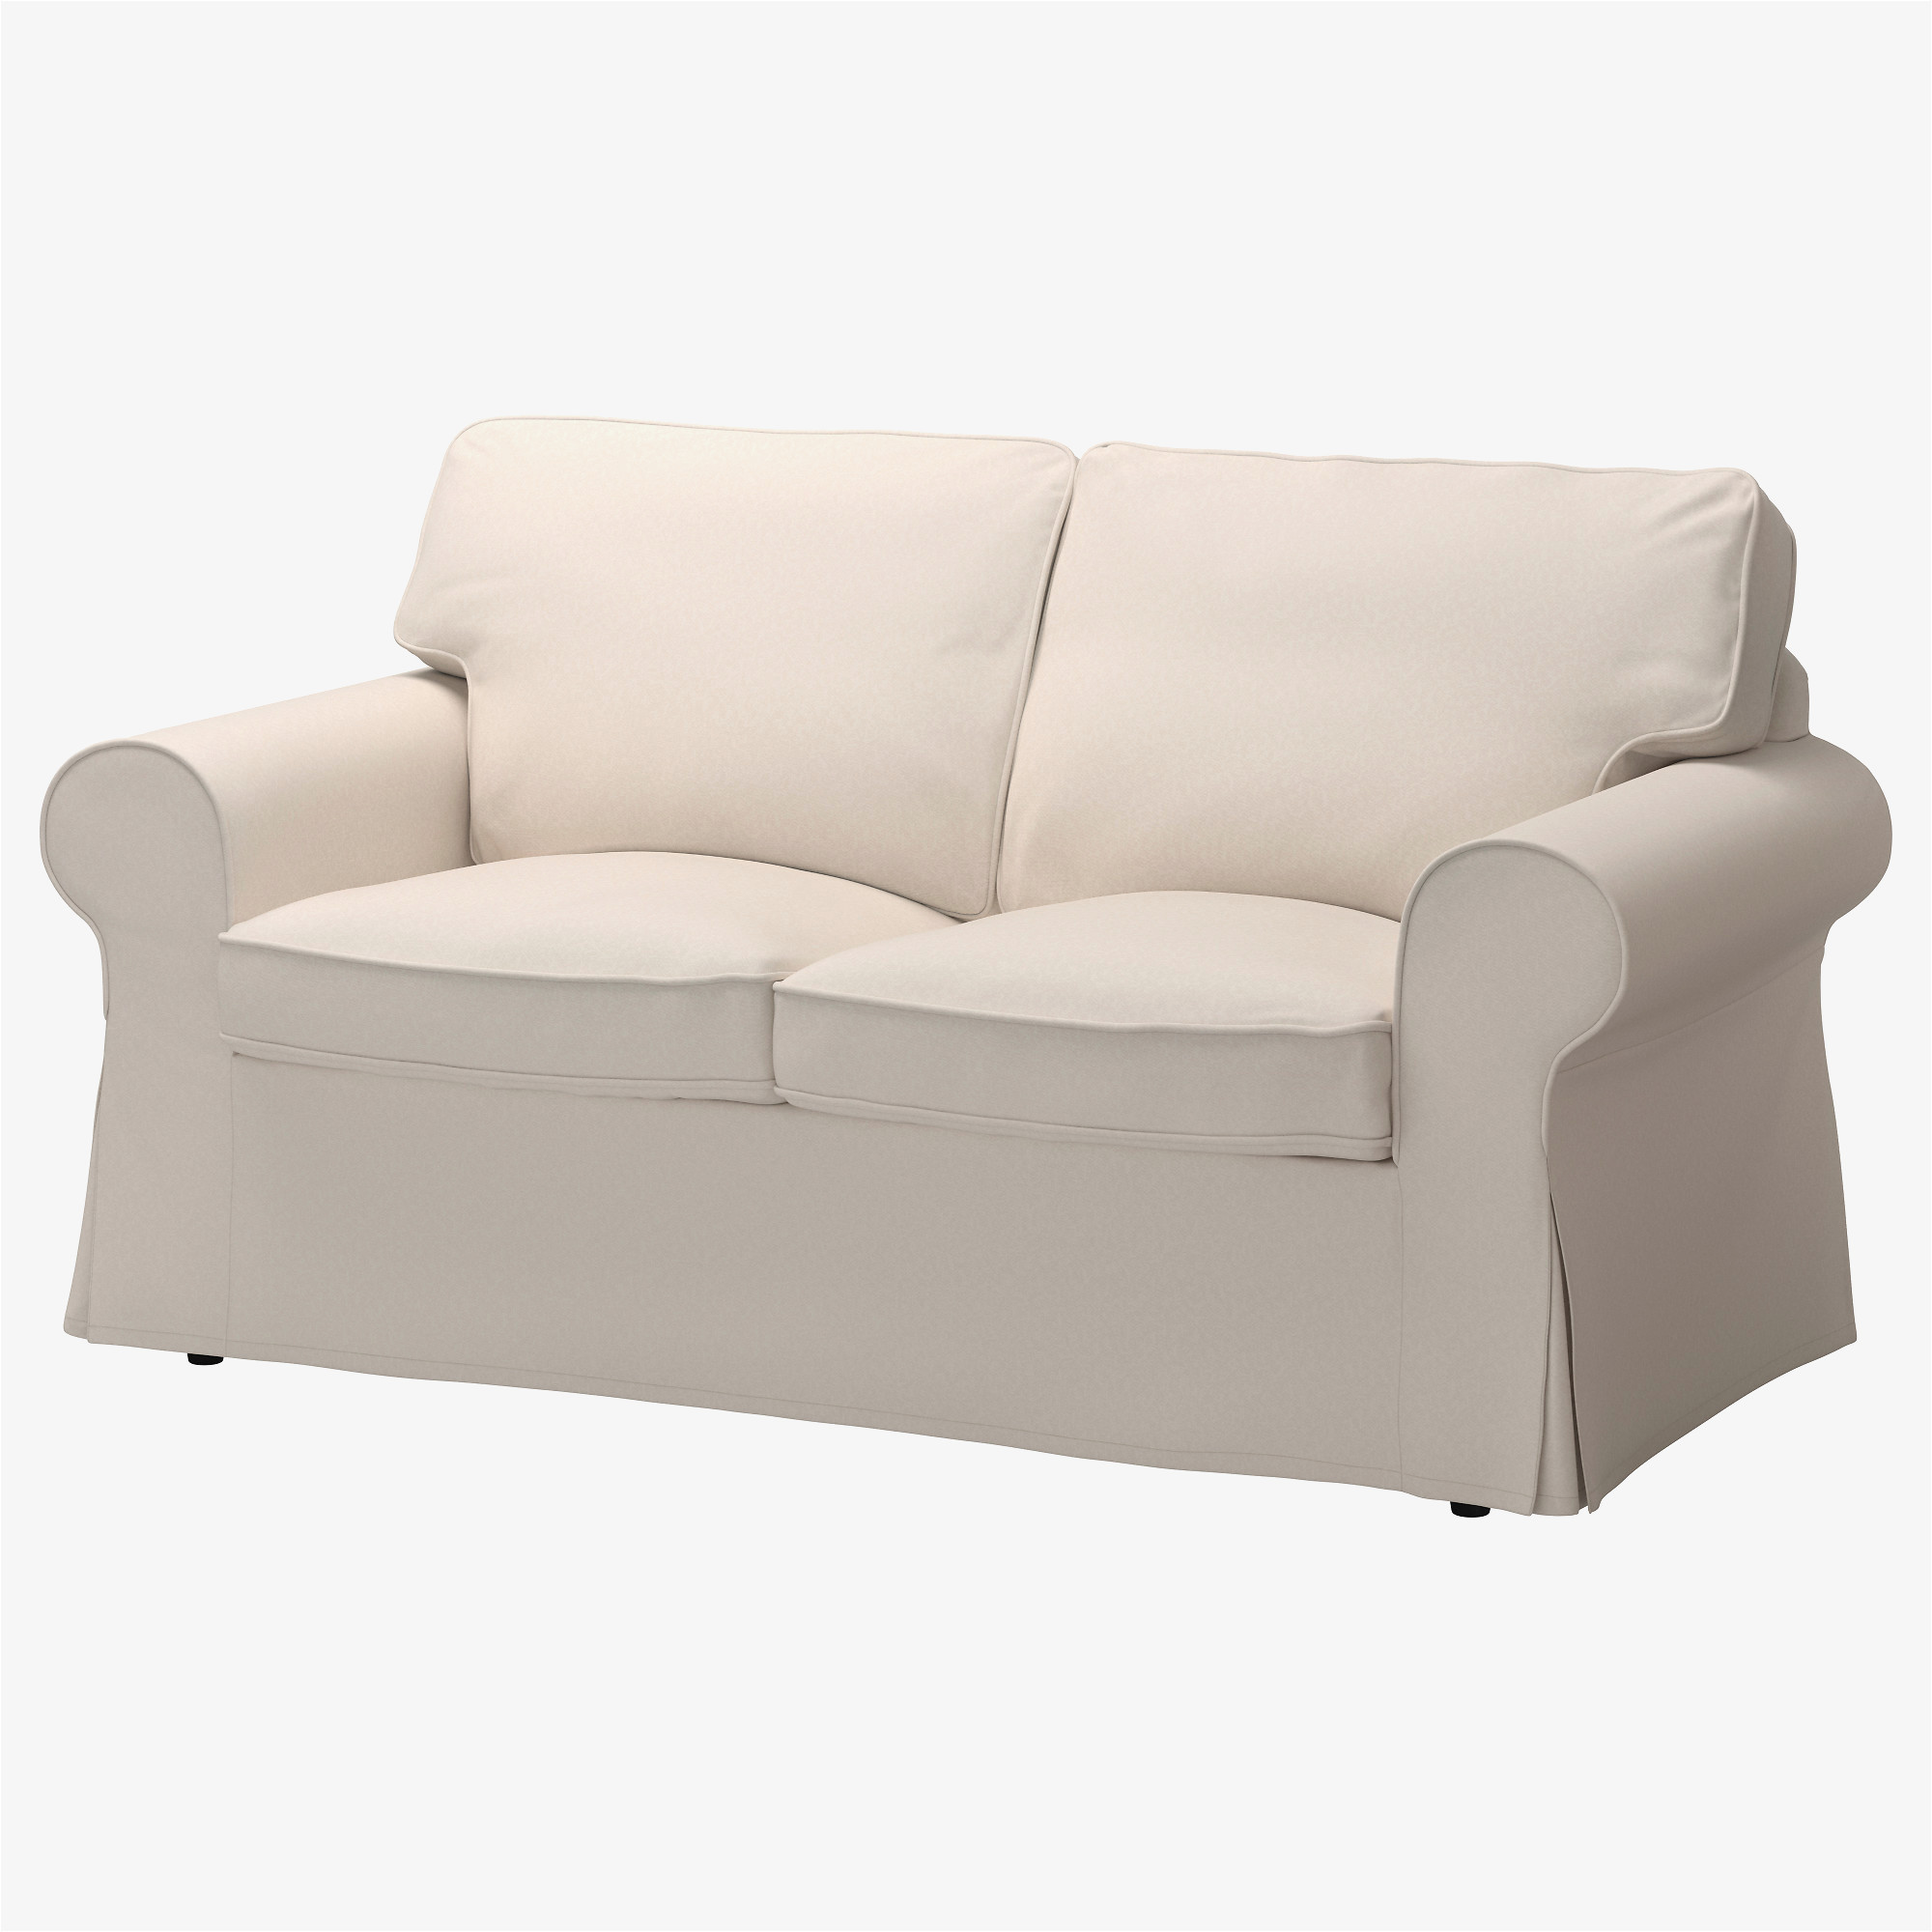 best ikea friheten sofa bed review home design image creative under home interior ideas